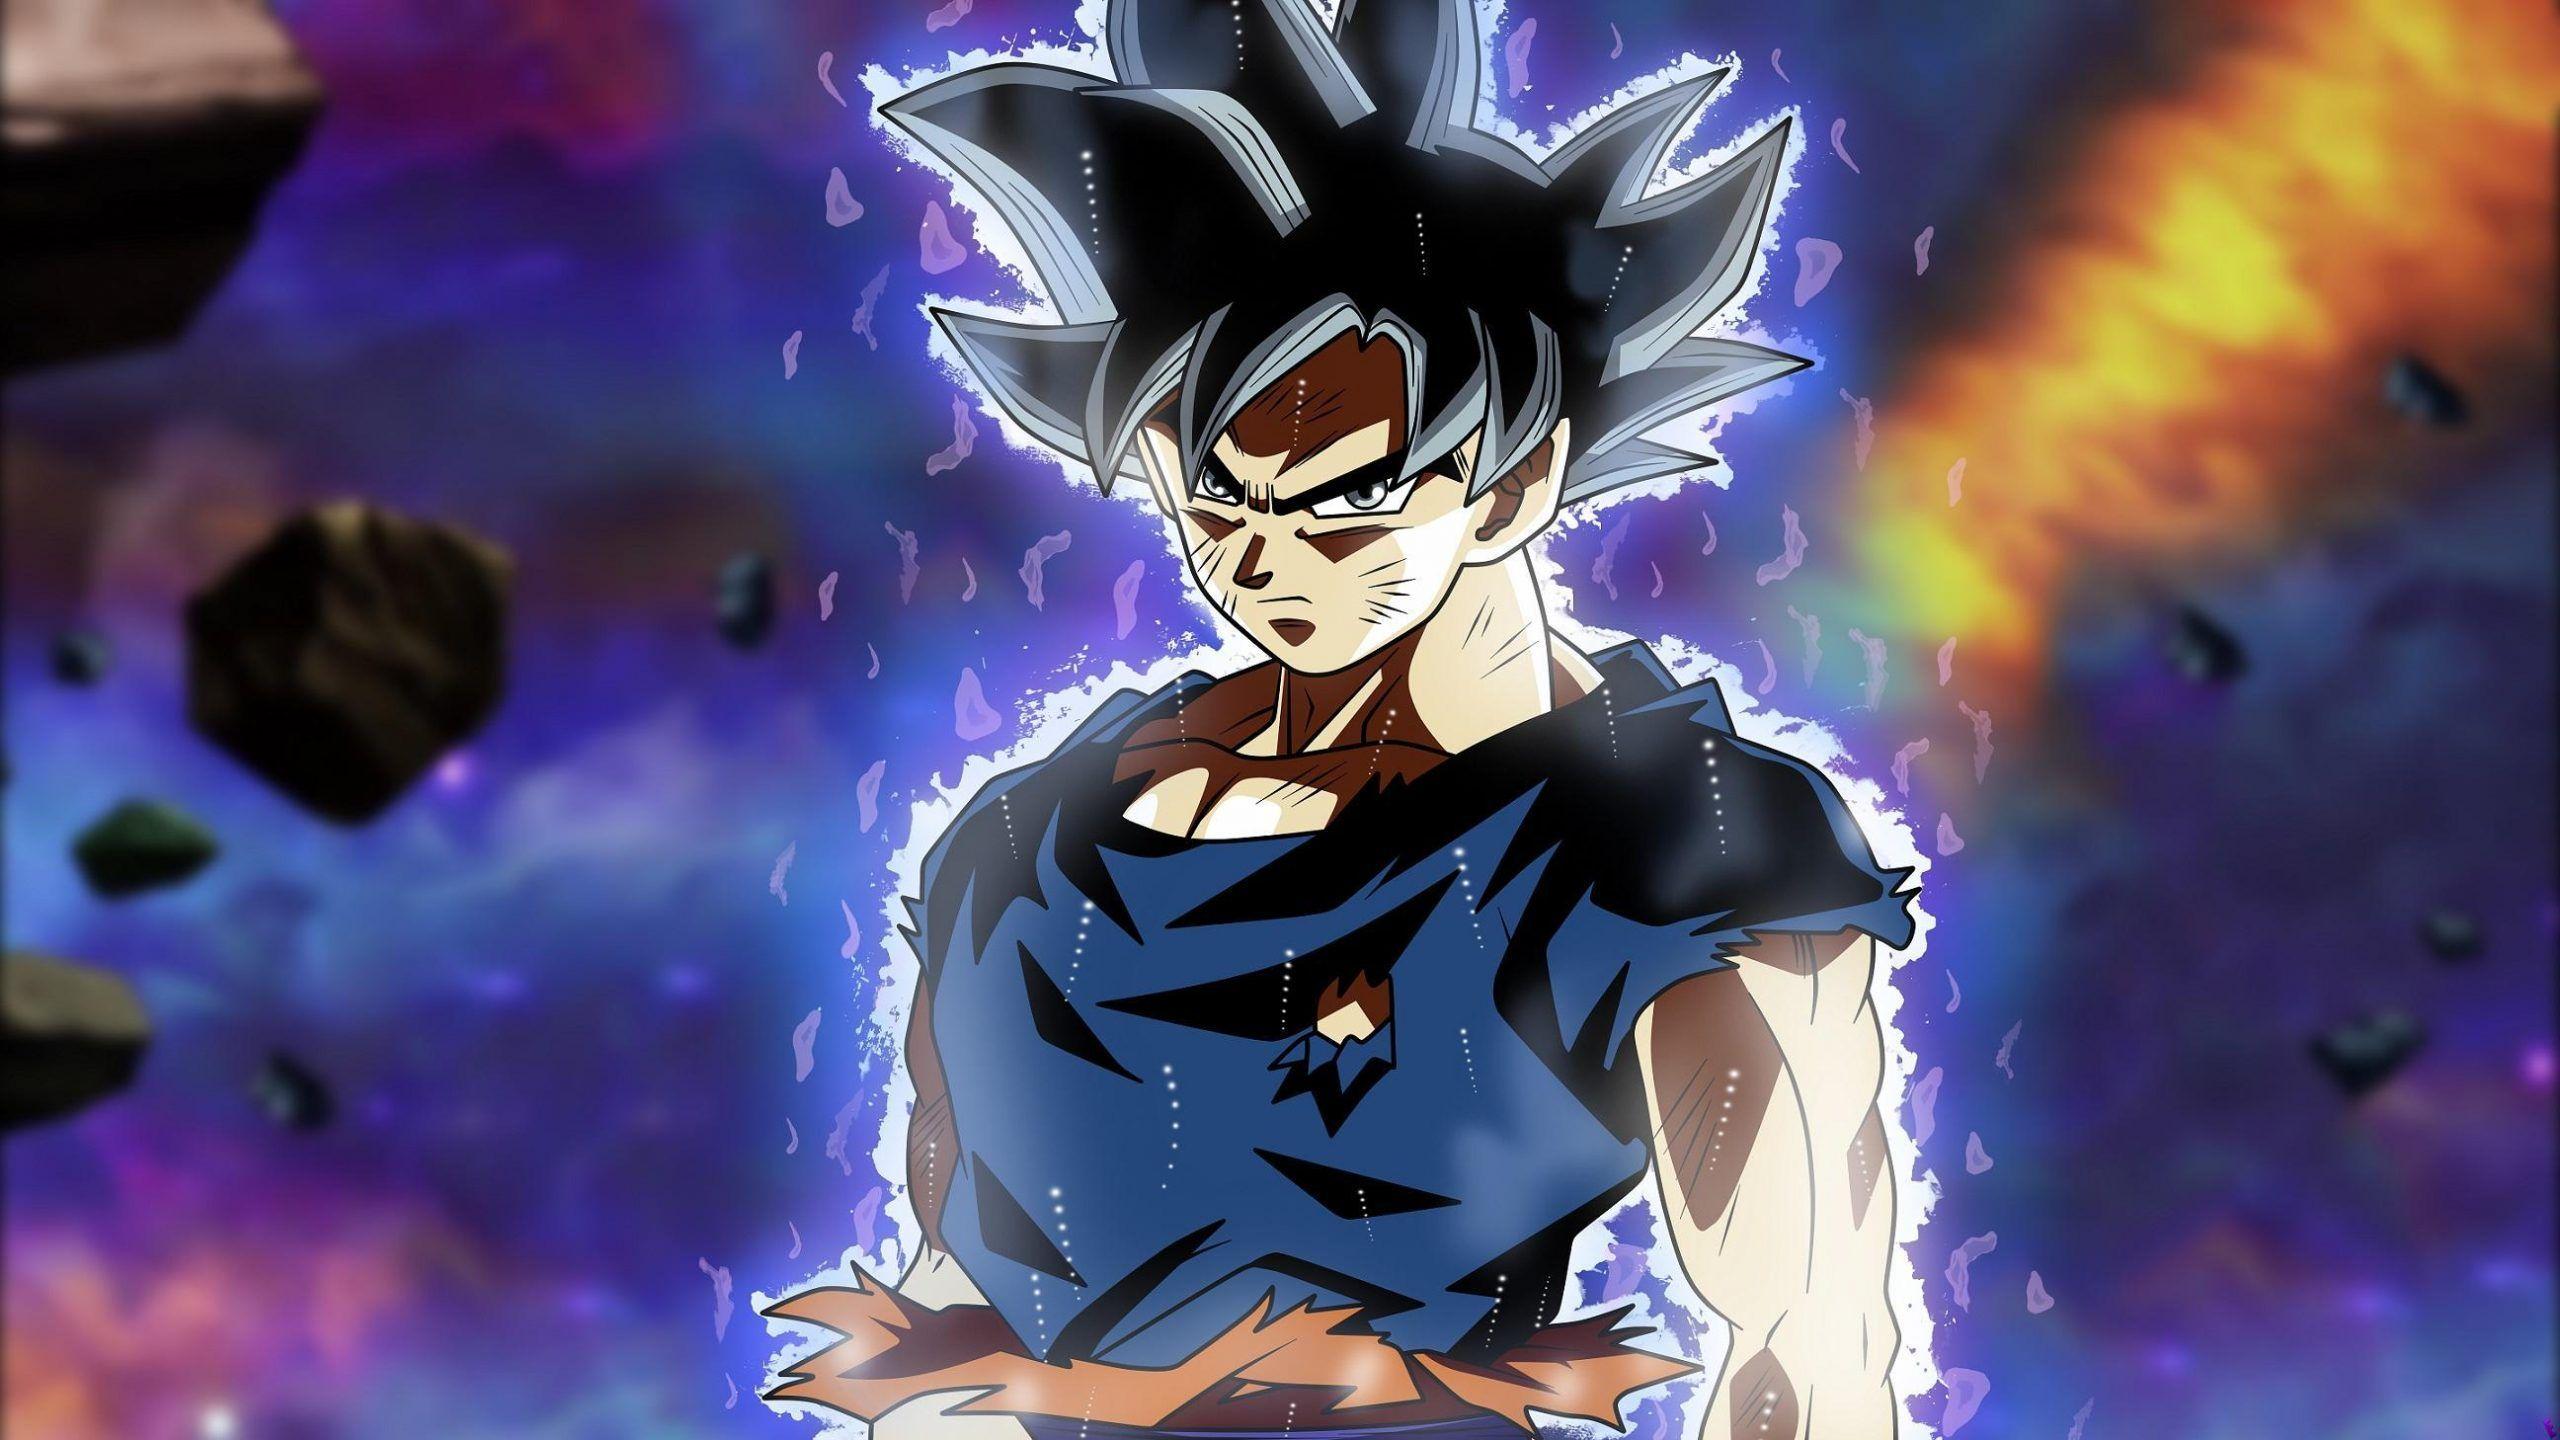 Pesepakbola Profesional Mengubah Namanya Menjadi Goku Karena Kecintaannya Pada Dragon Ball Anime Saku Goku Dragon Ball Dragon